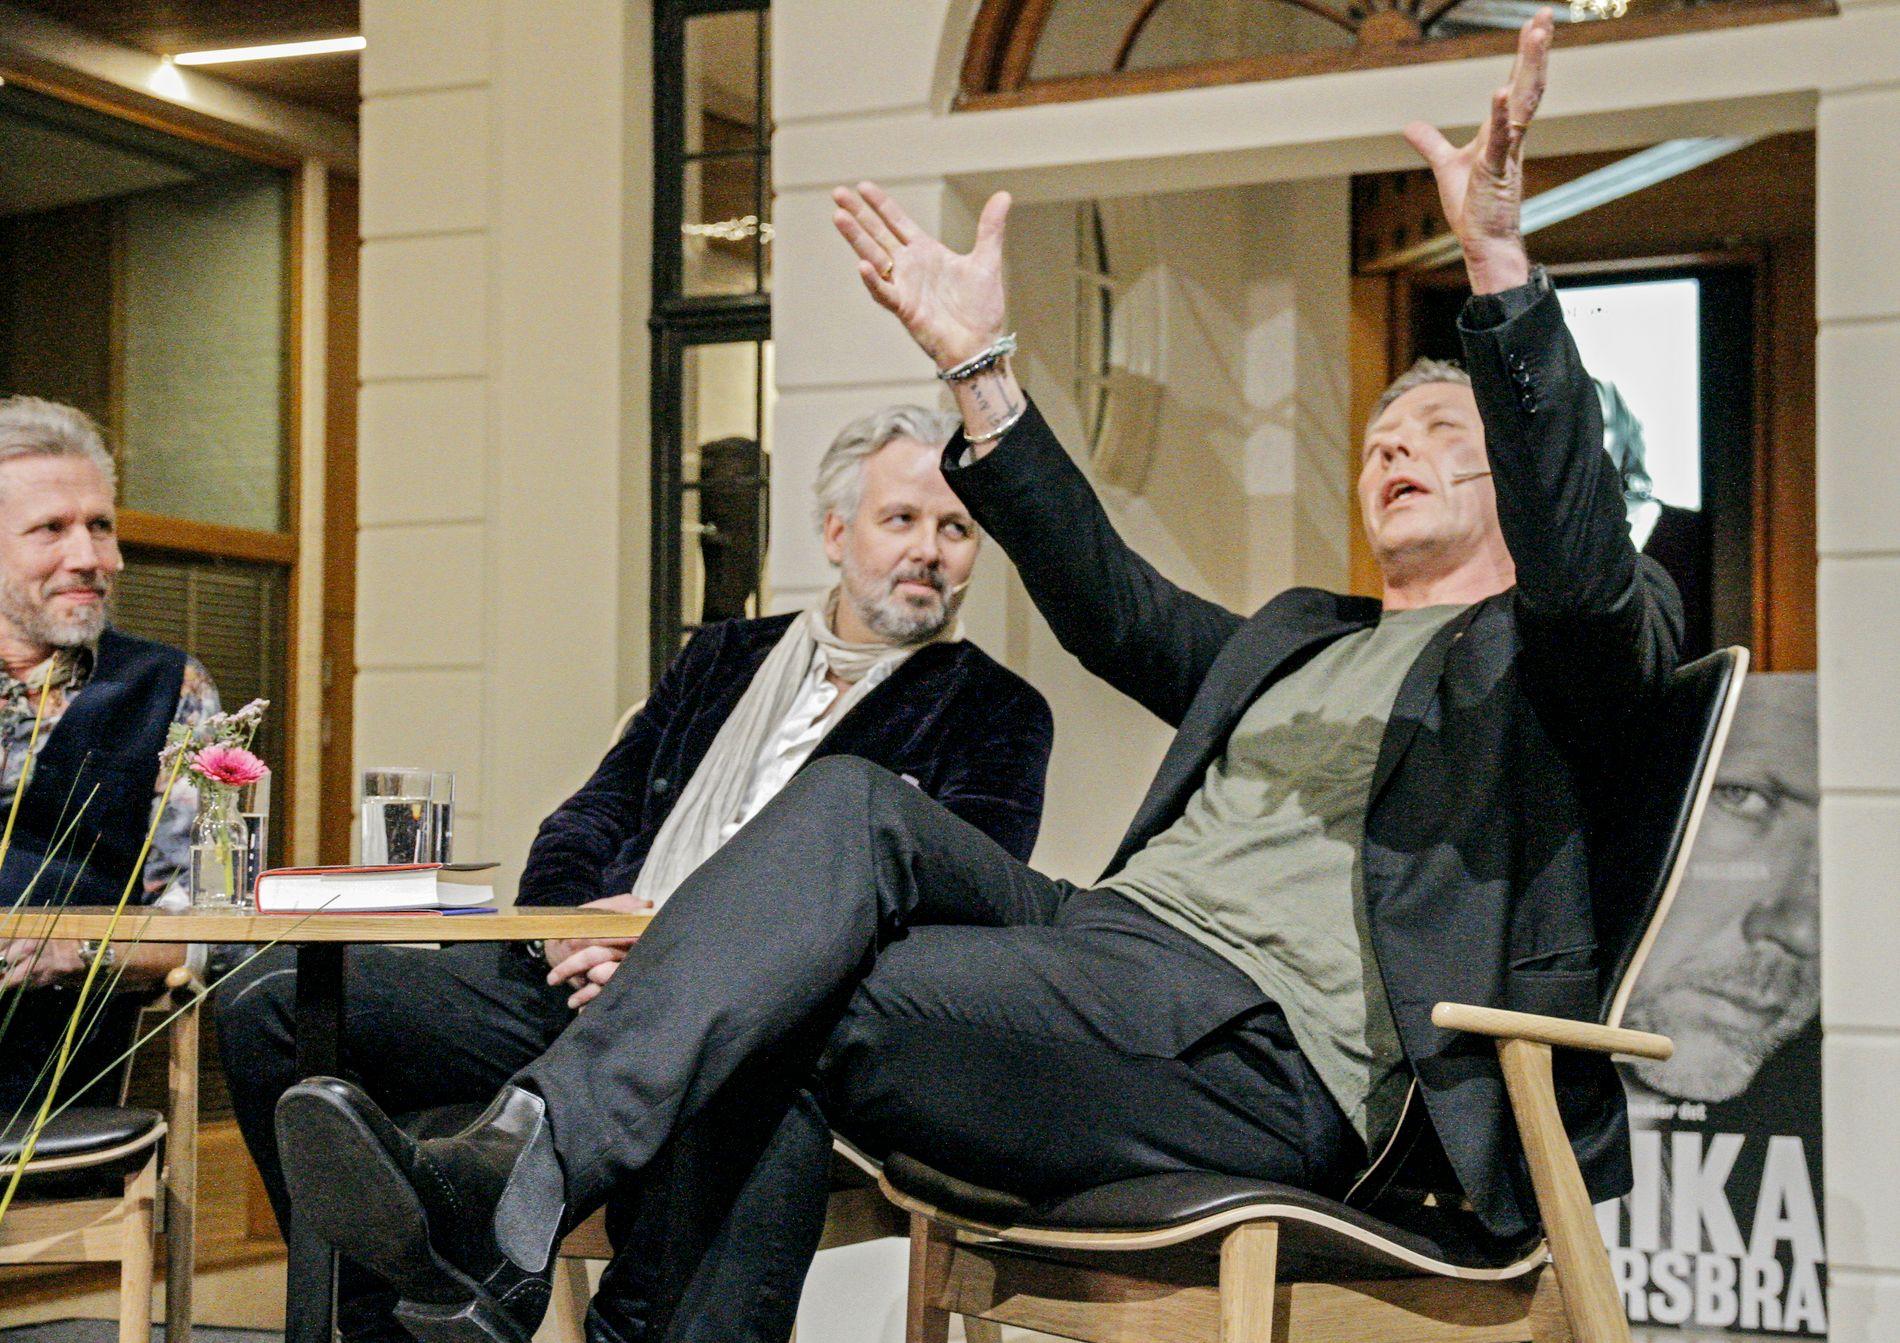 ENTUSIASTISK: Carl-Johan Vallgren, Ari Behn og Mikael Persbrandt.